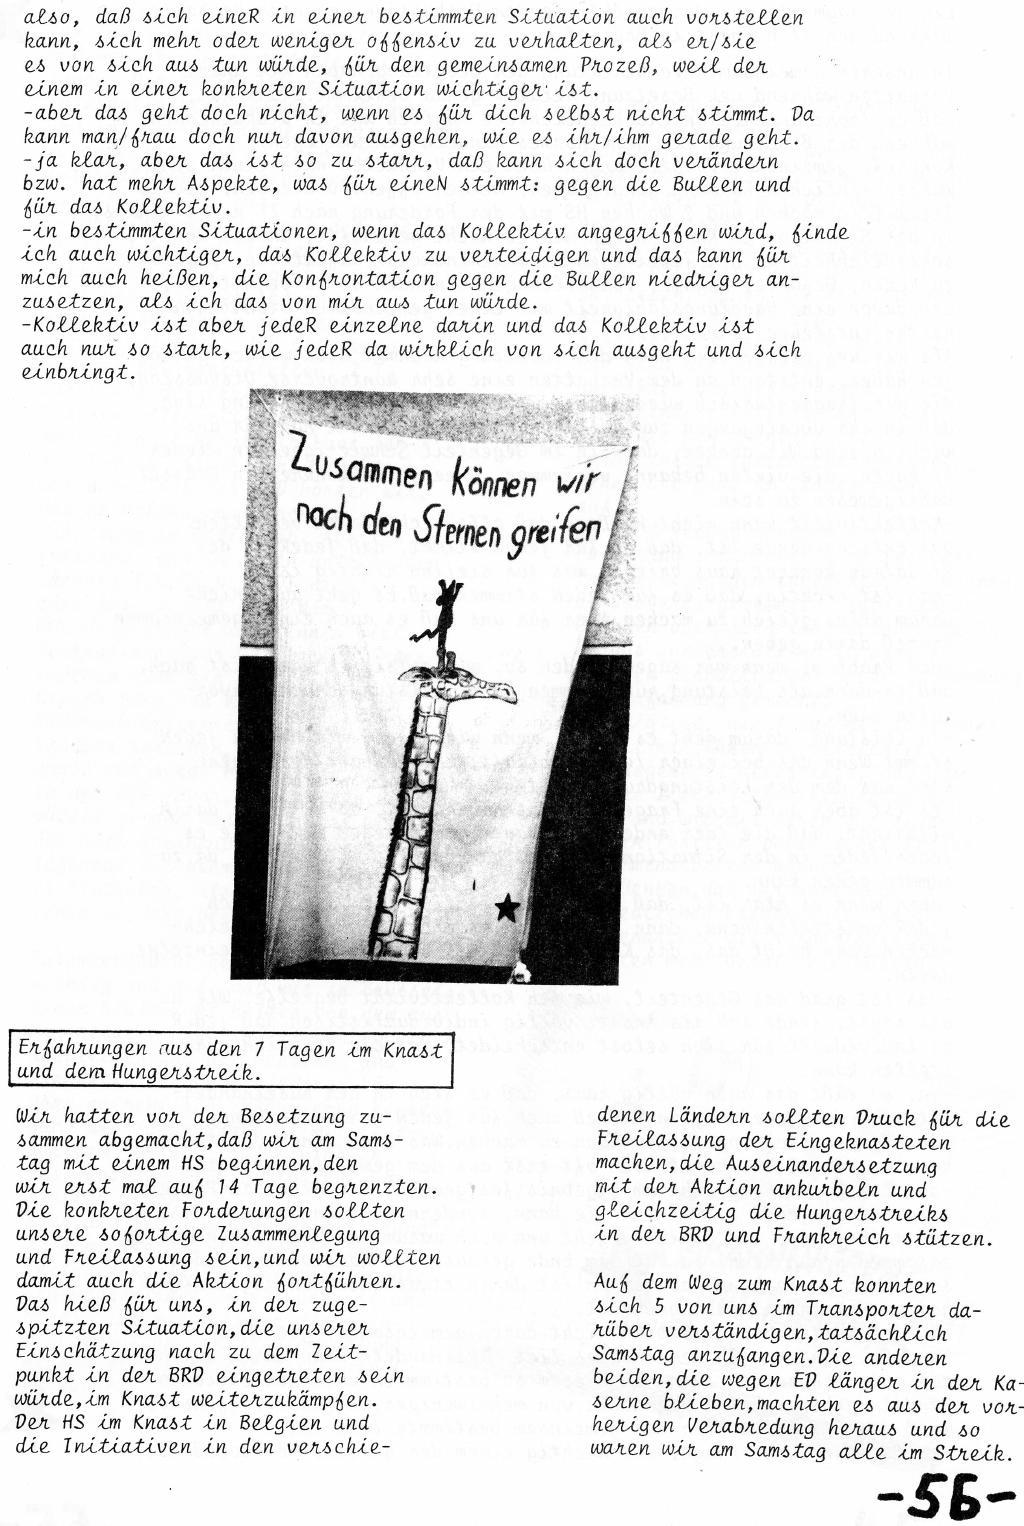 Belgien_Doku_Besetzung_EG_Kommission_1989_058